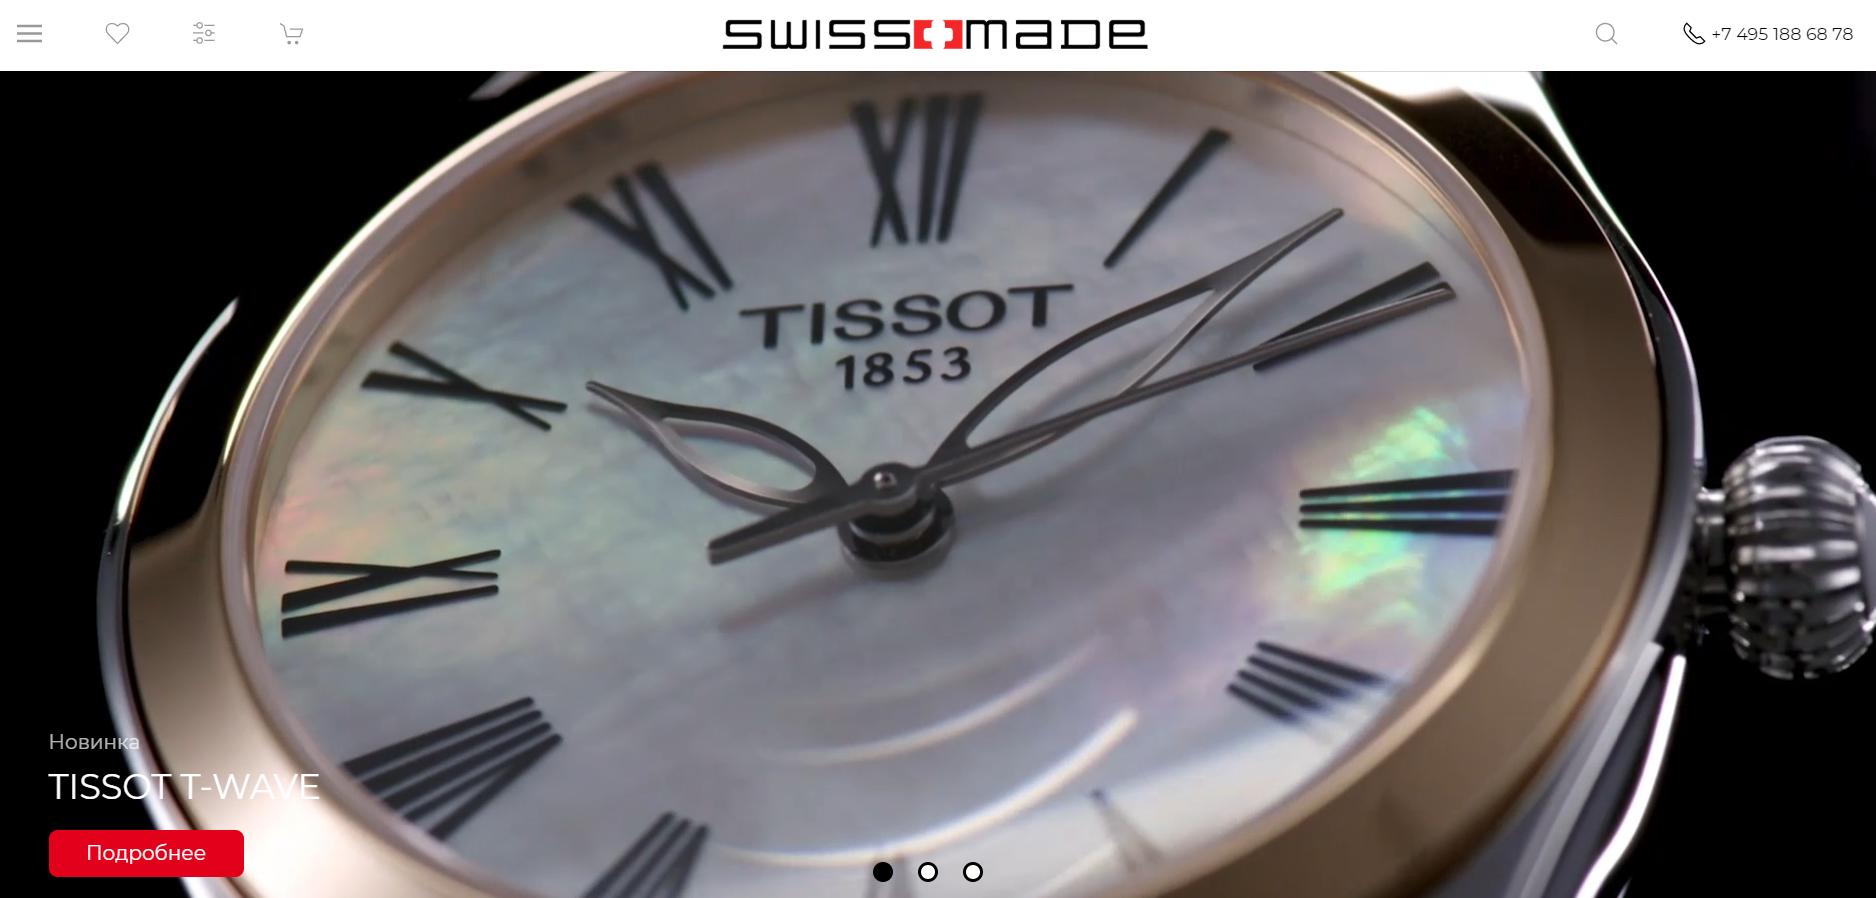 Дистрибьютор швейцарских часов SWISSMADE